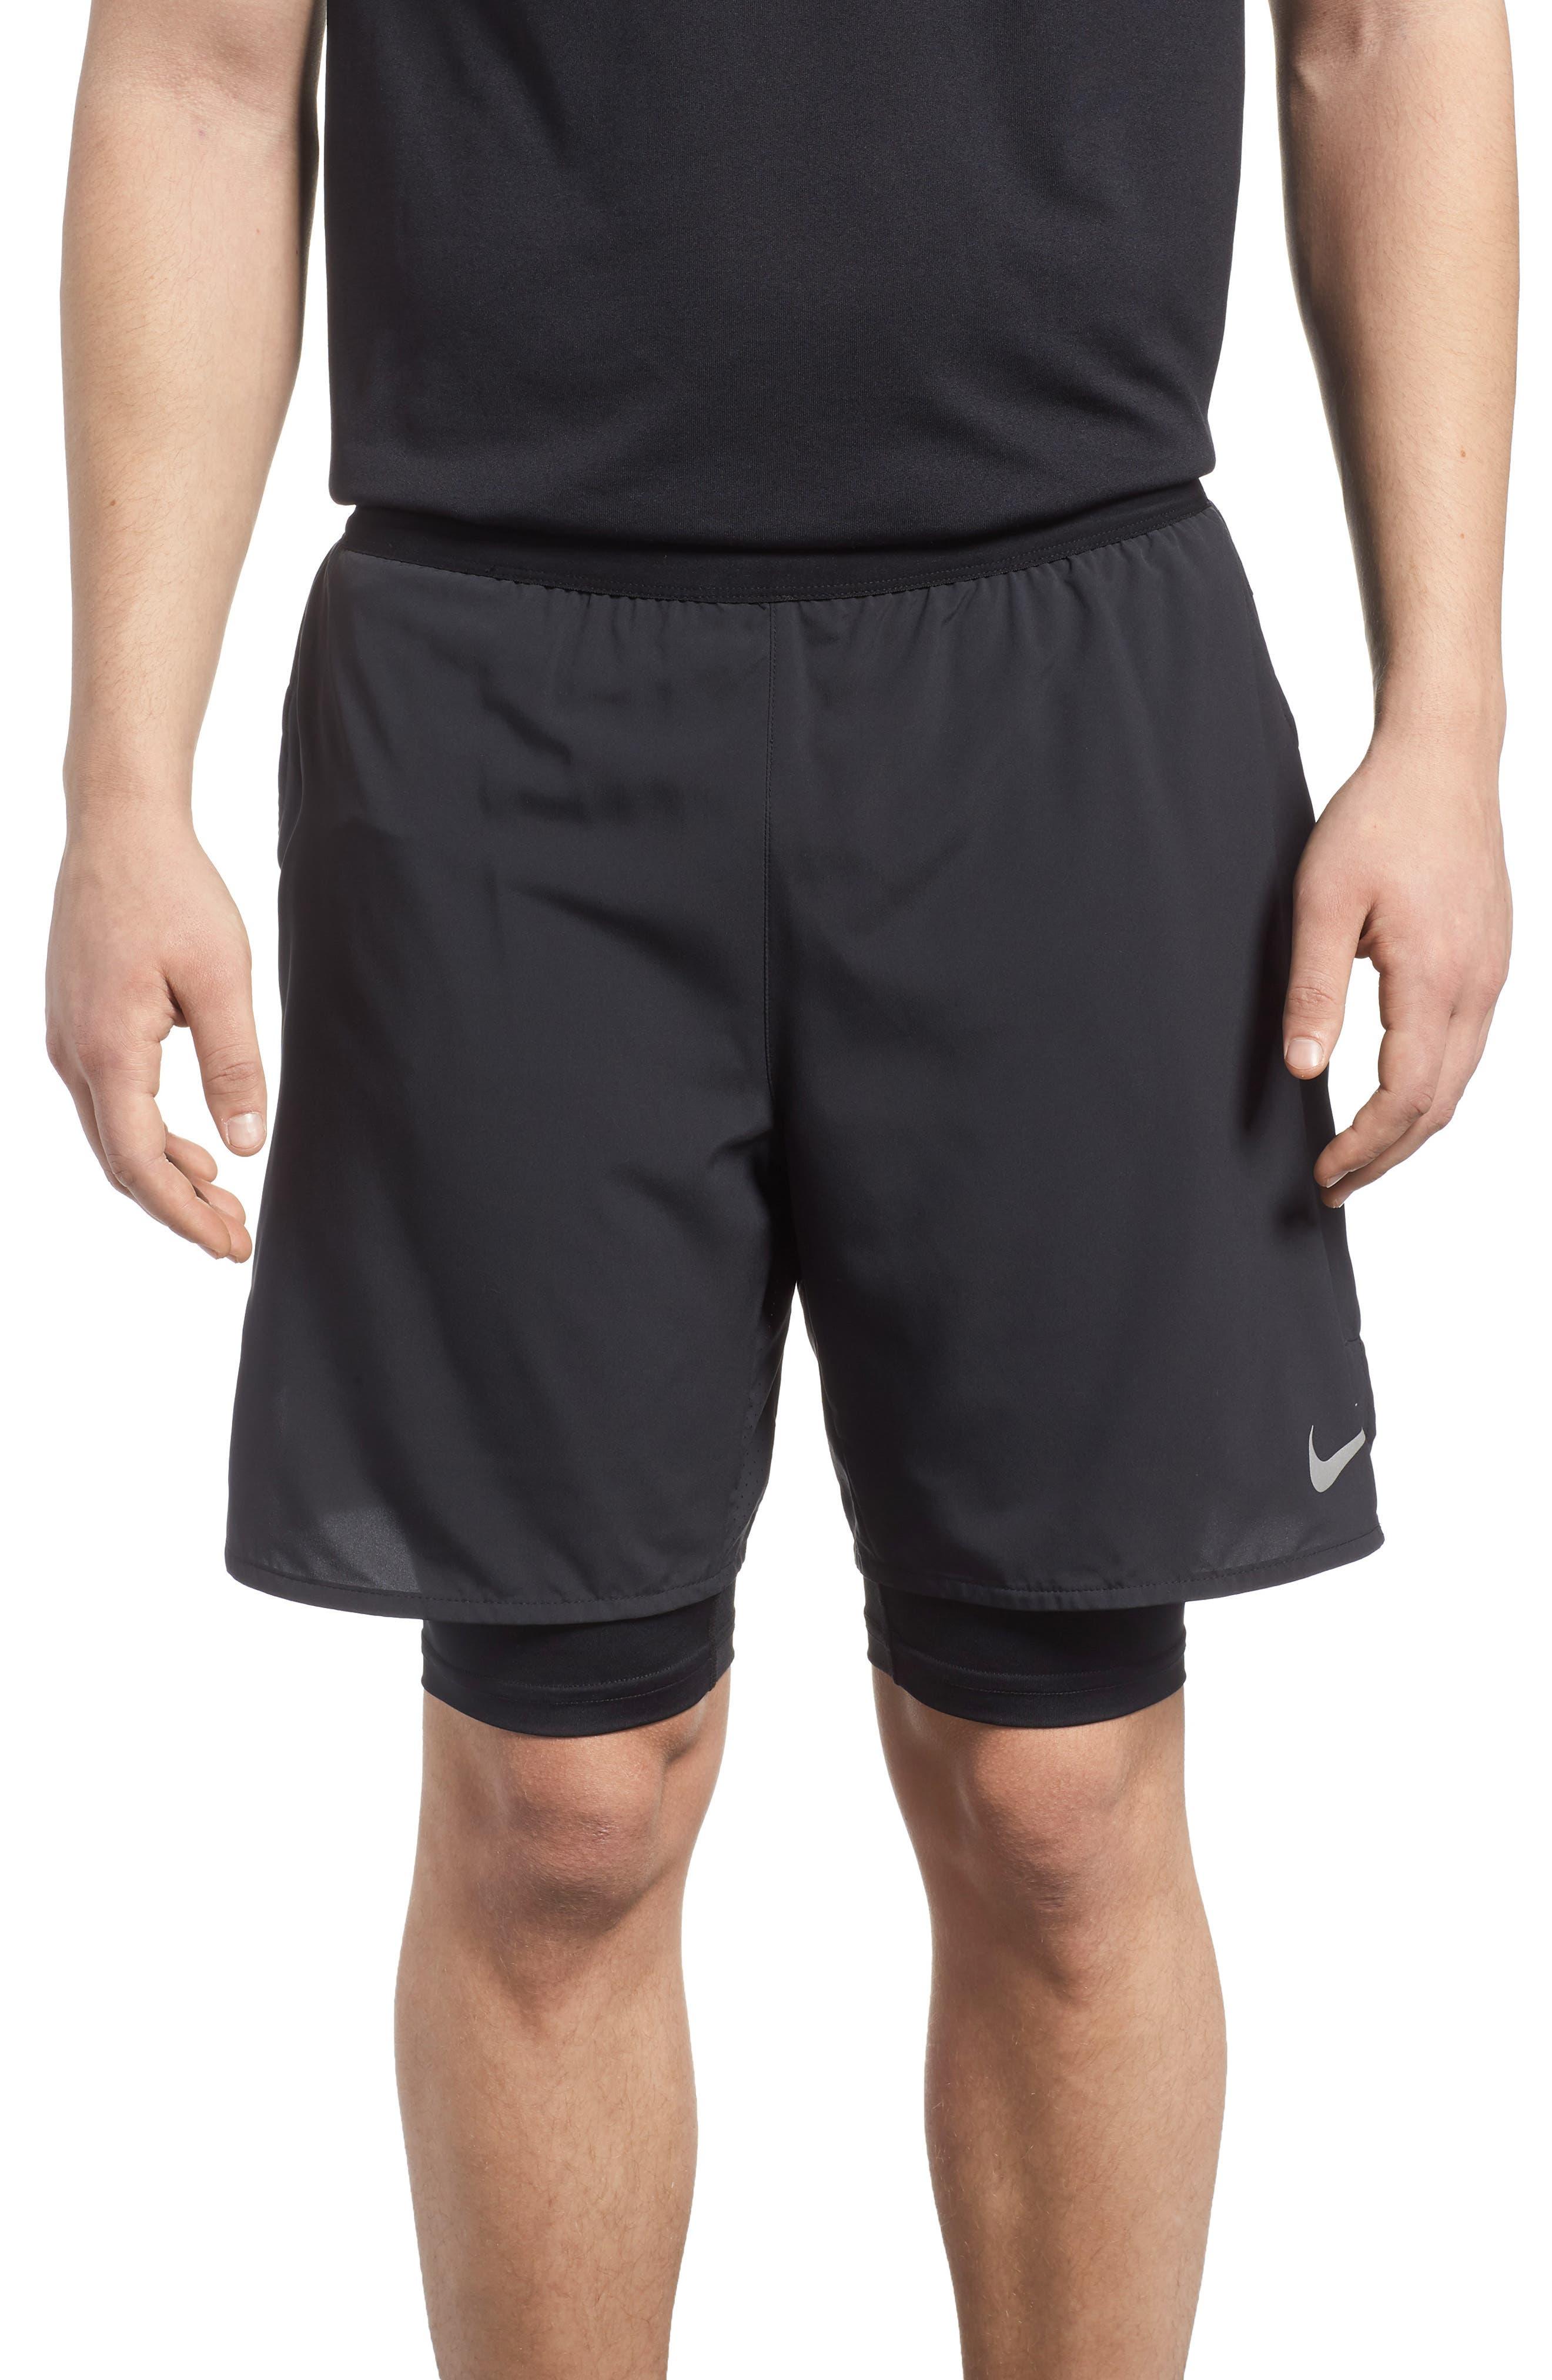 Flex Distance Running Shorts,                         Main,                         color, Black/ Black